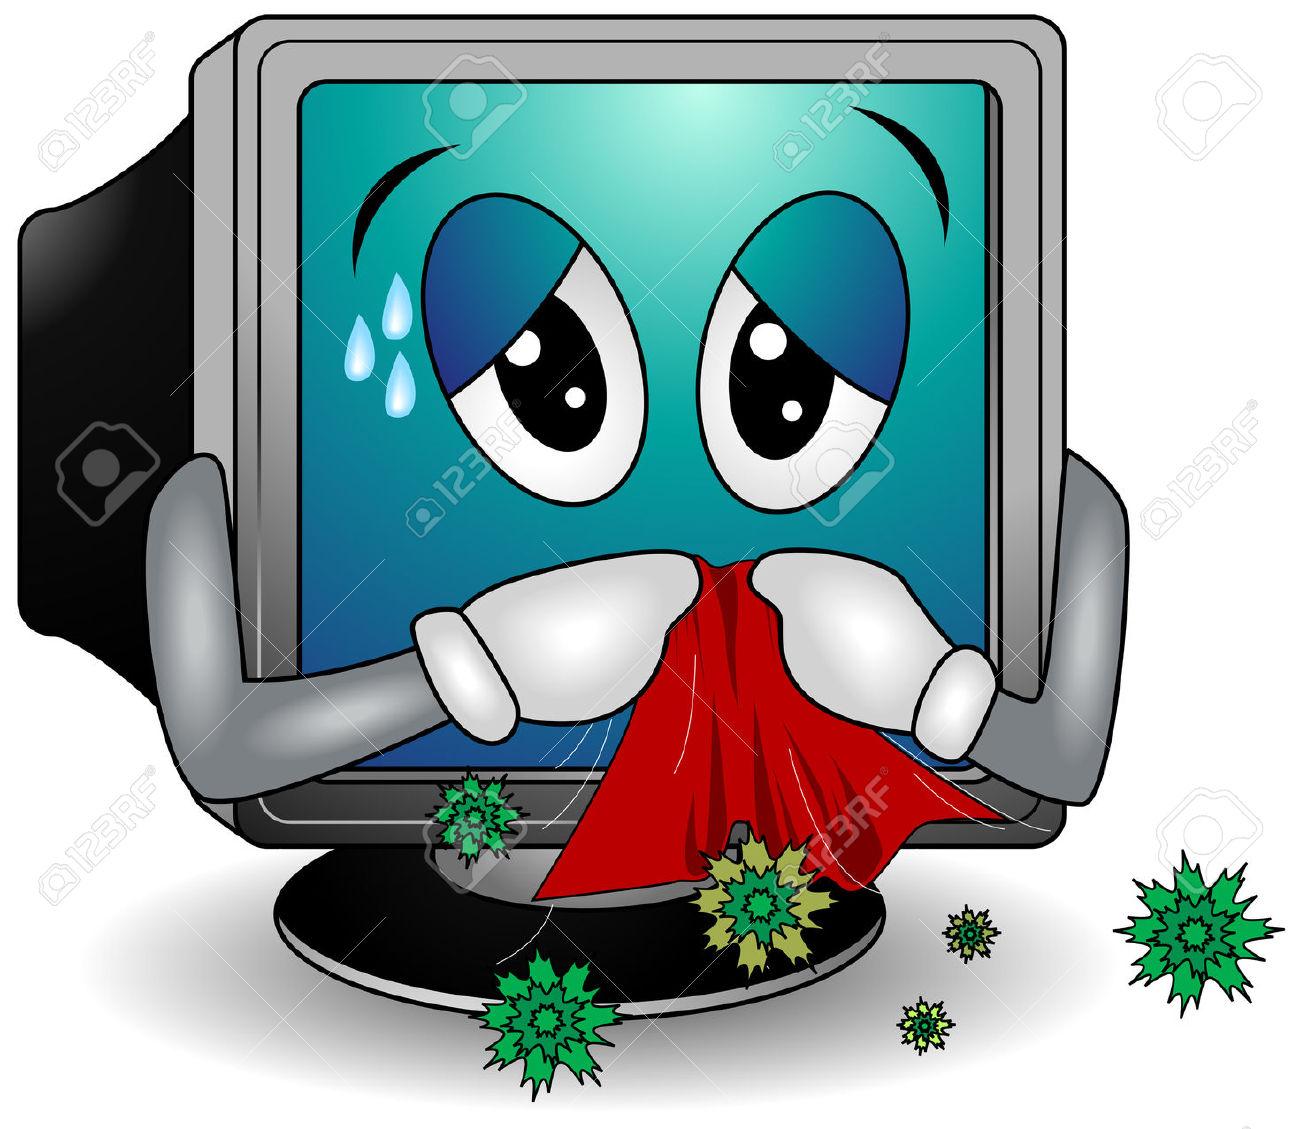 Sick Computer Clipart | Free download best Sick Computer ...